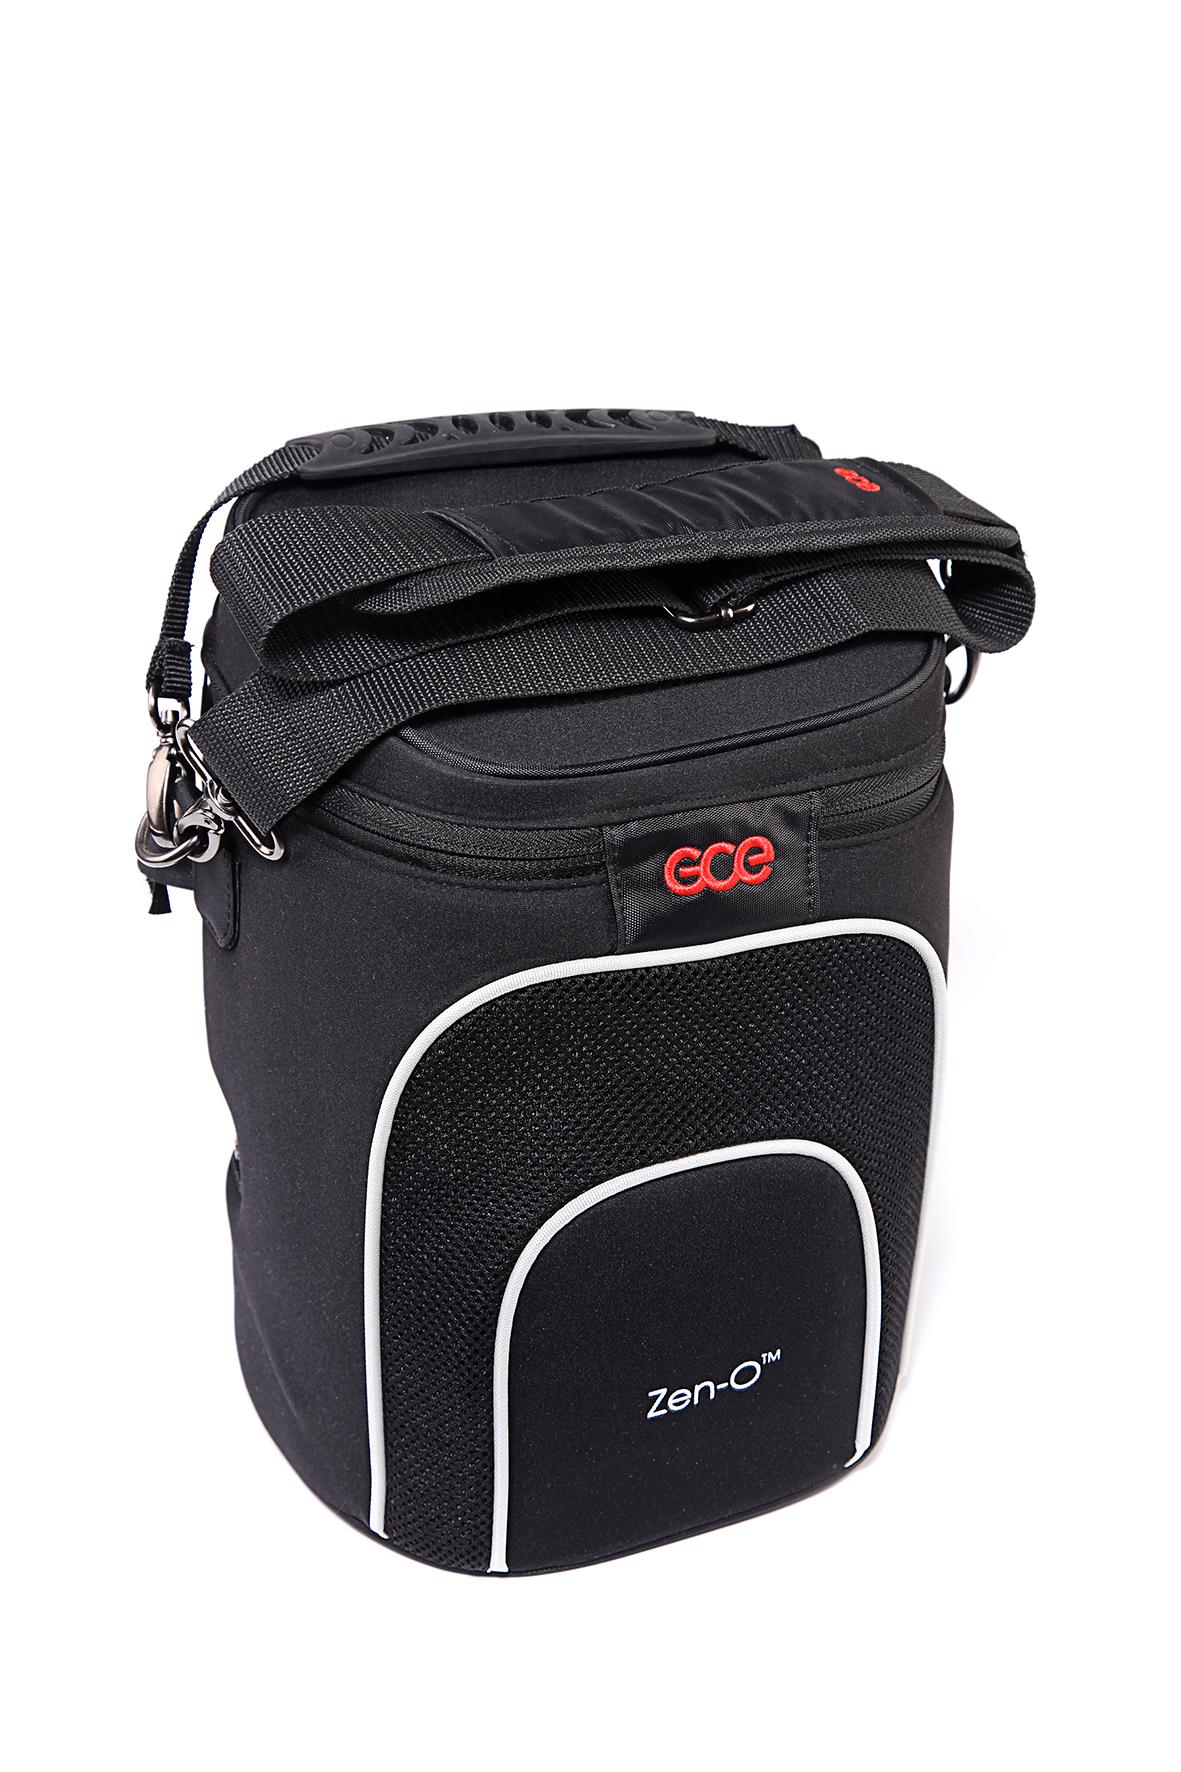 Zen-O Custom Carrying Case